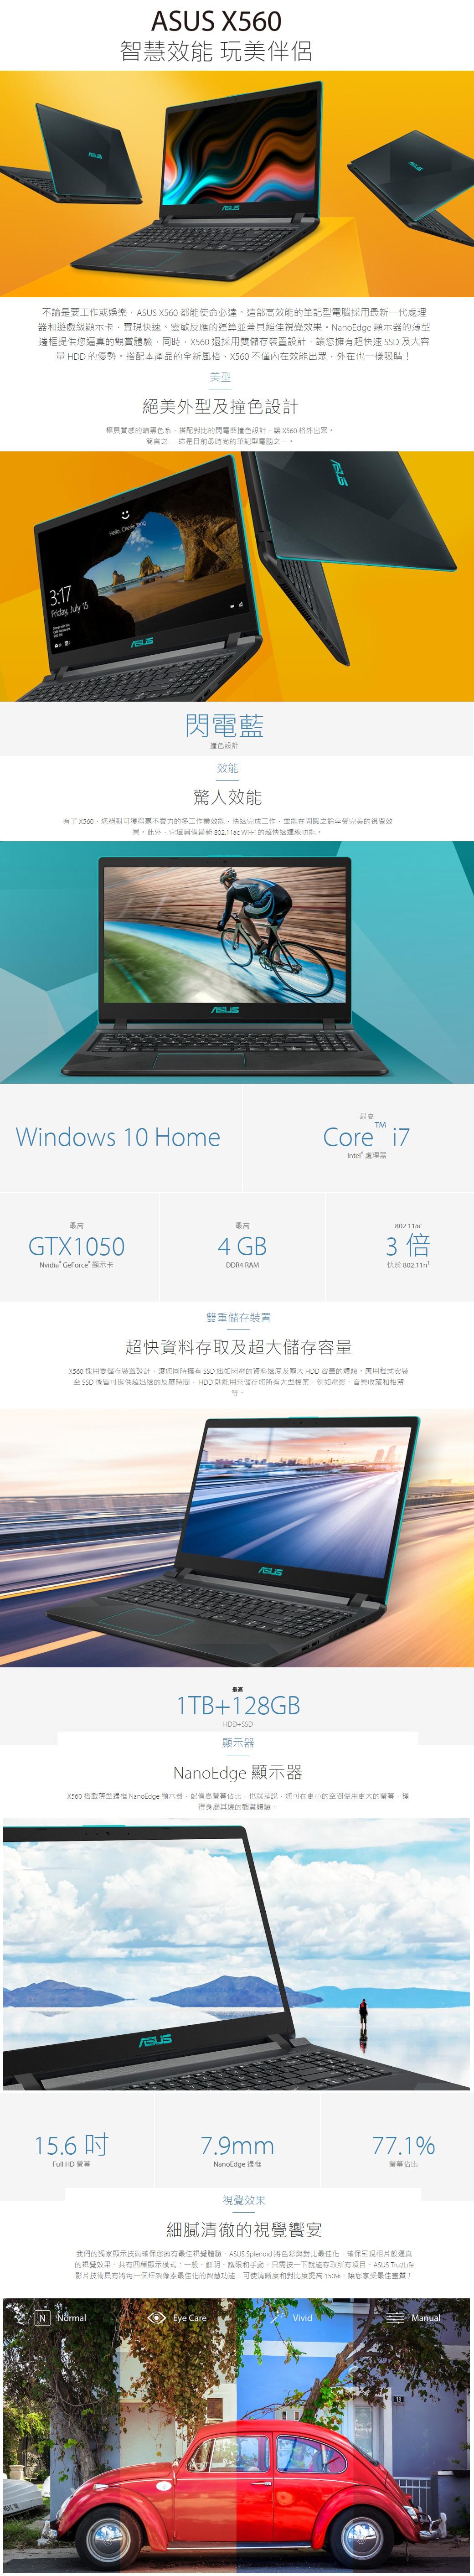 X560_1.jpg